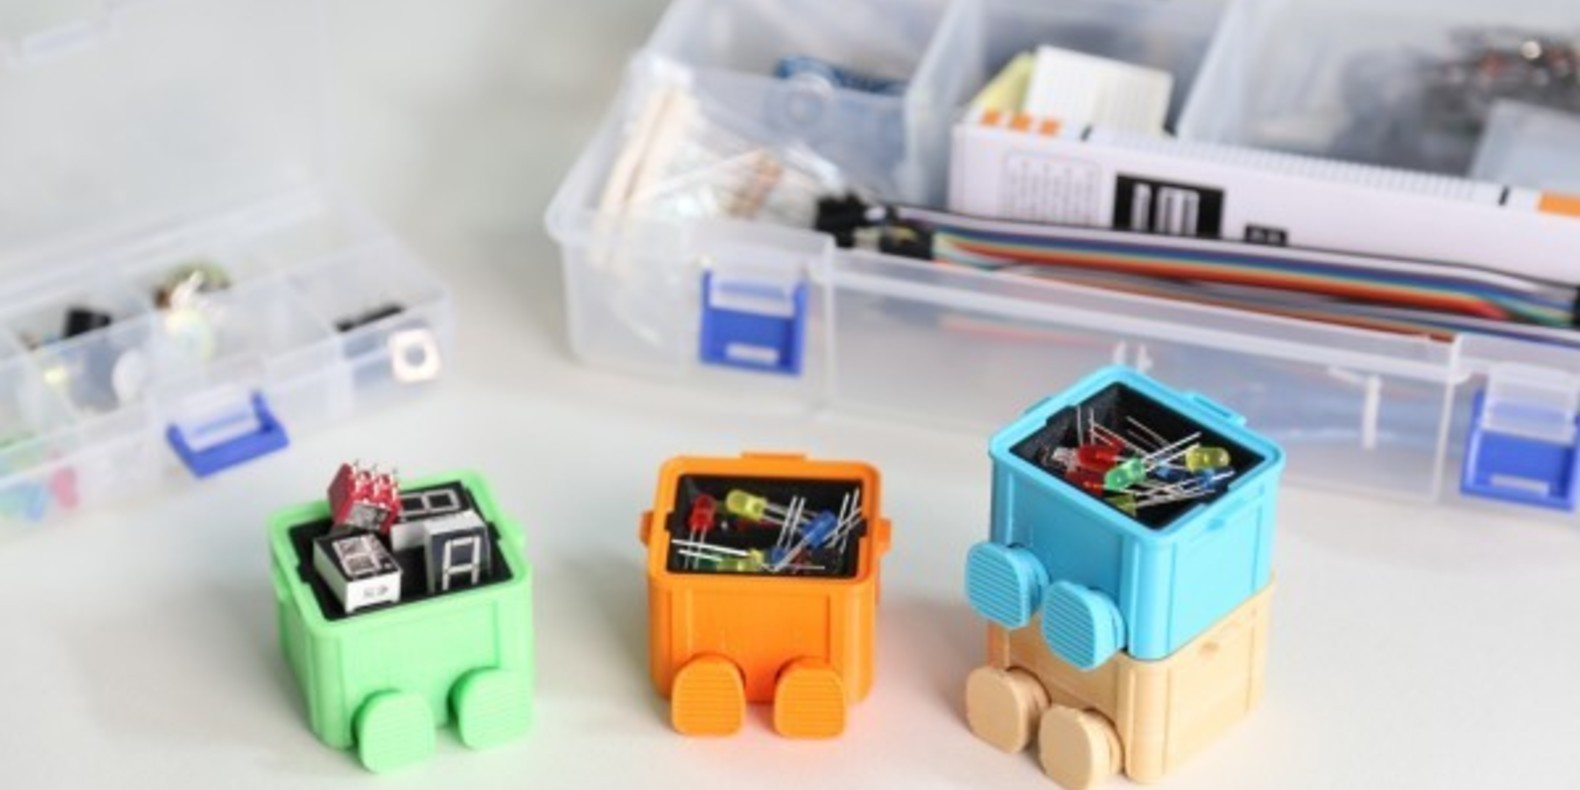 Step box step boite a outils tool box 3D printed 3D printing imprimée en 3D impression 3D Cults 2